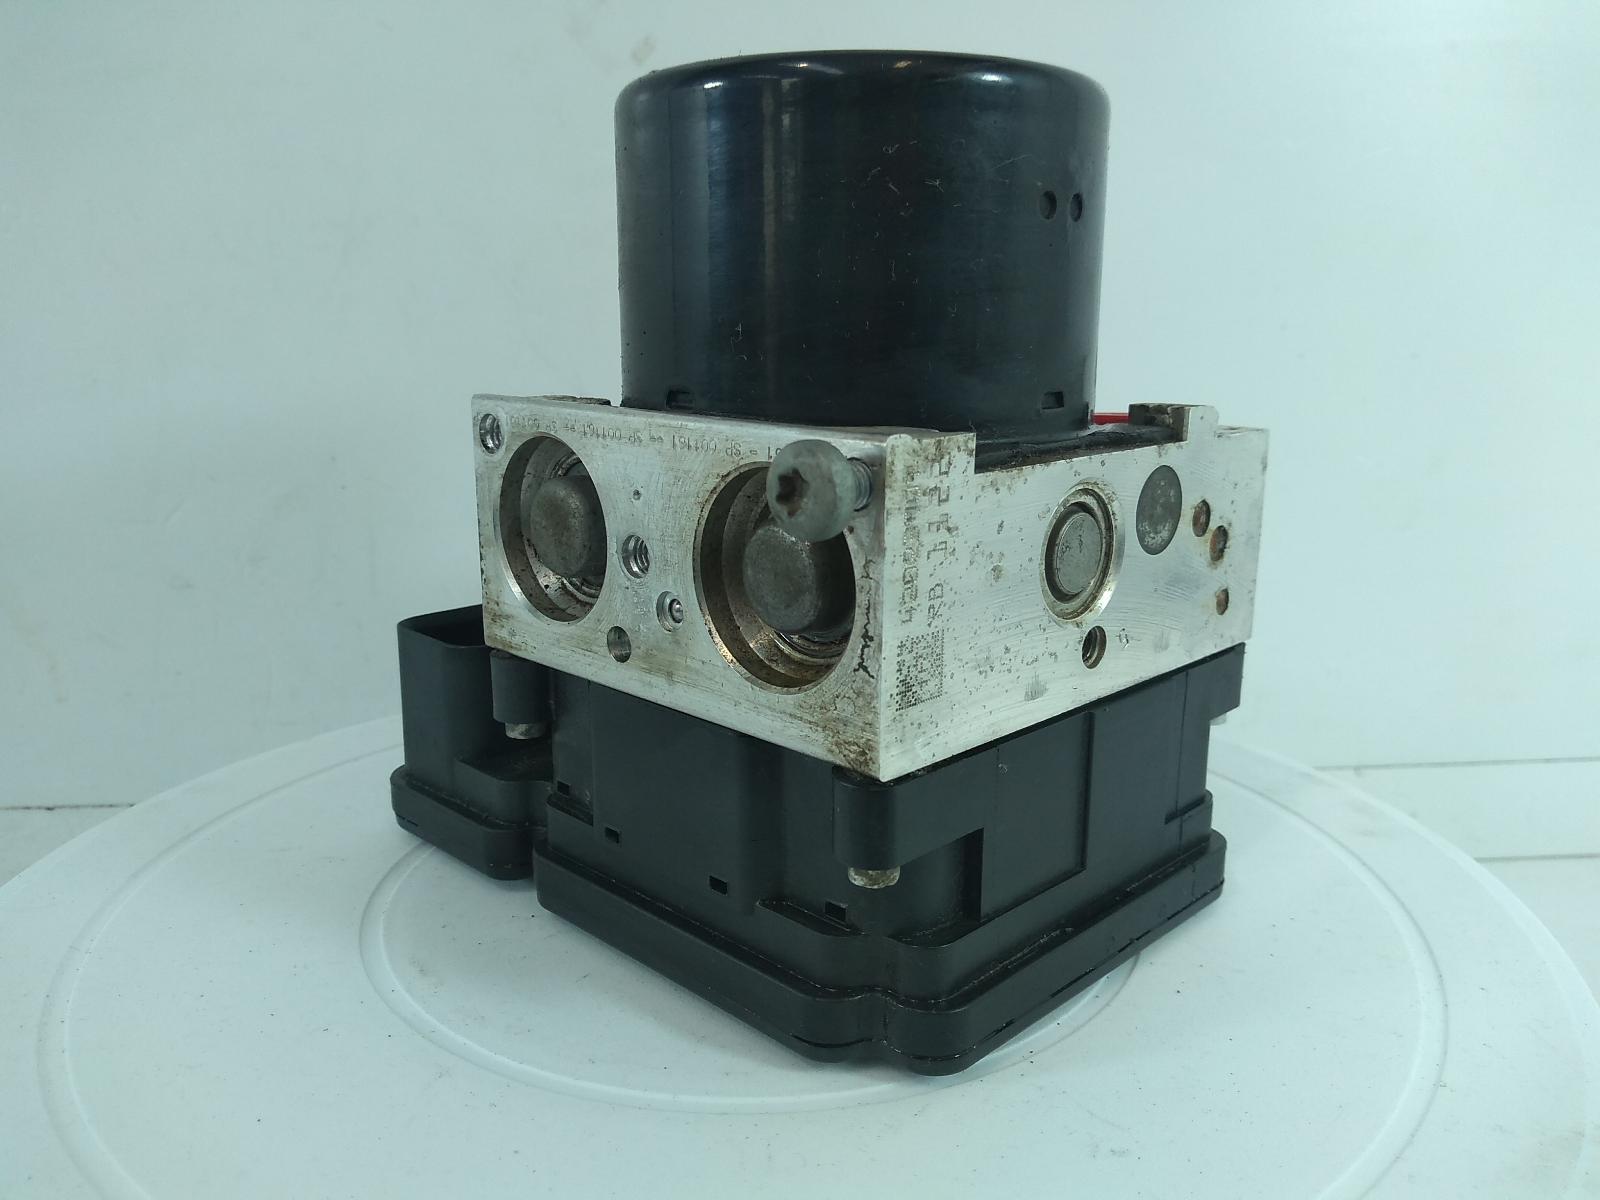 2014-VOLKSWAGEN-CADDY-Mk3-ABS-Pump-273 thumbnail 4